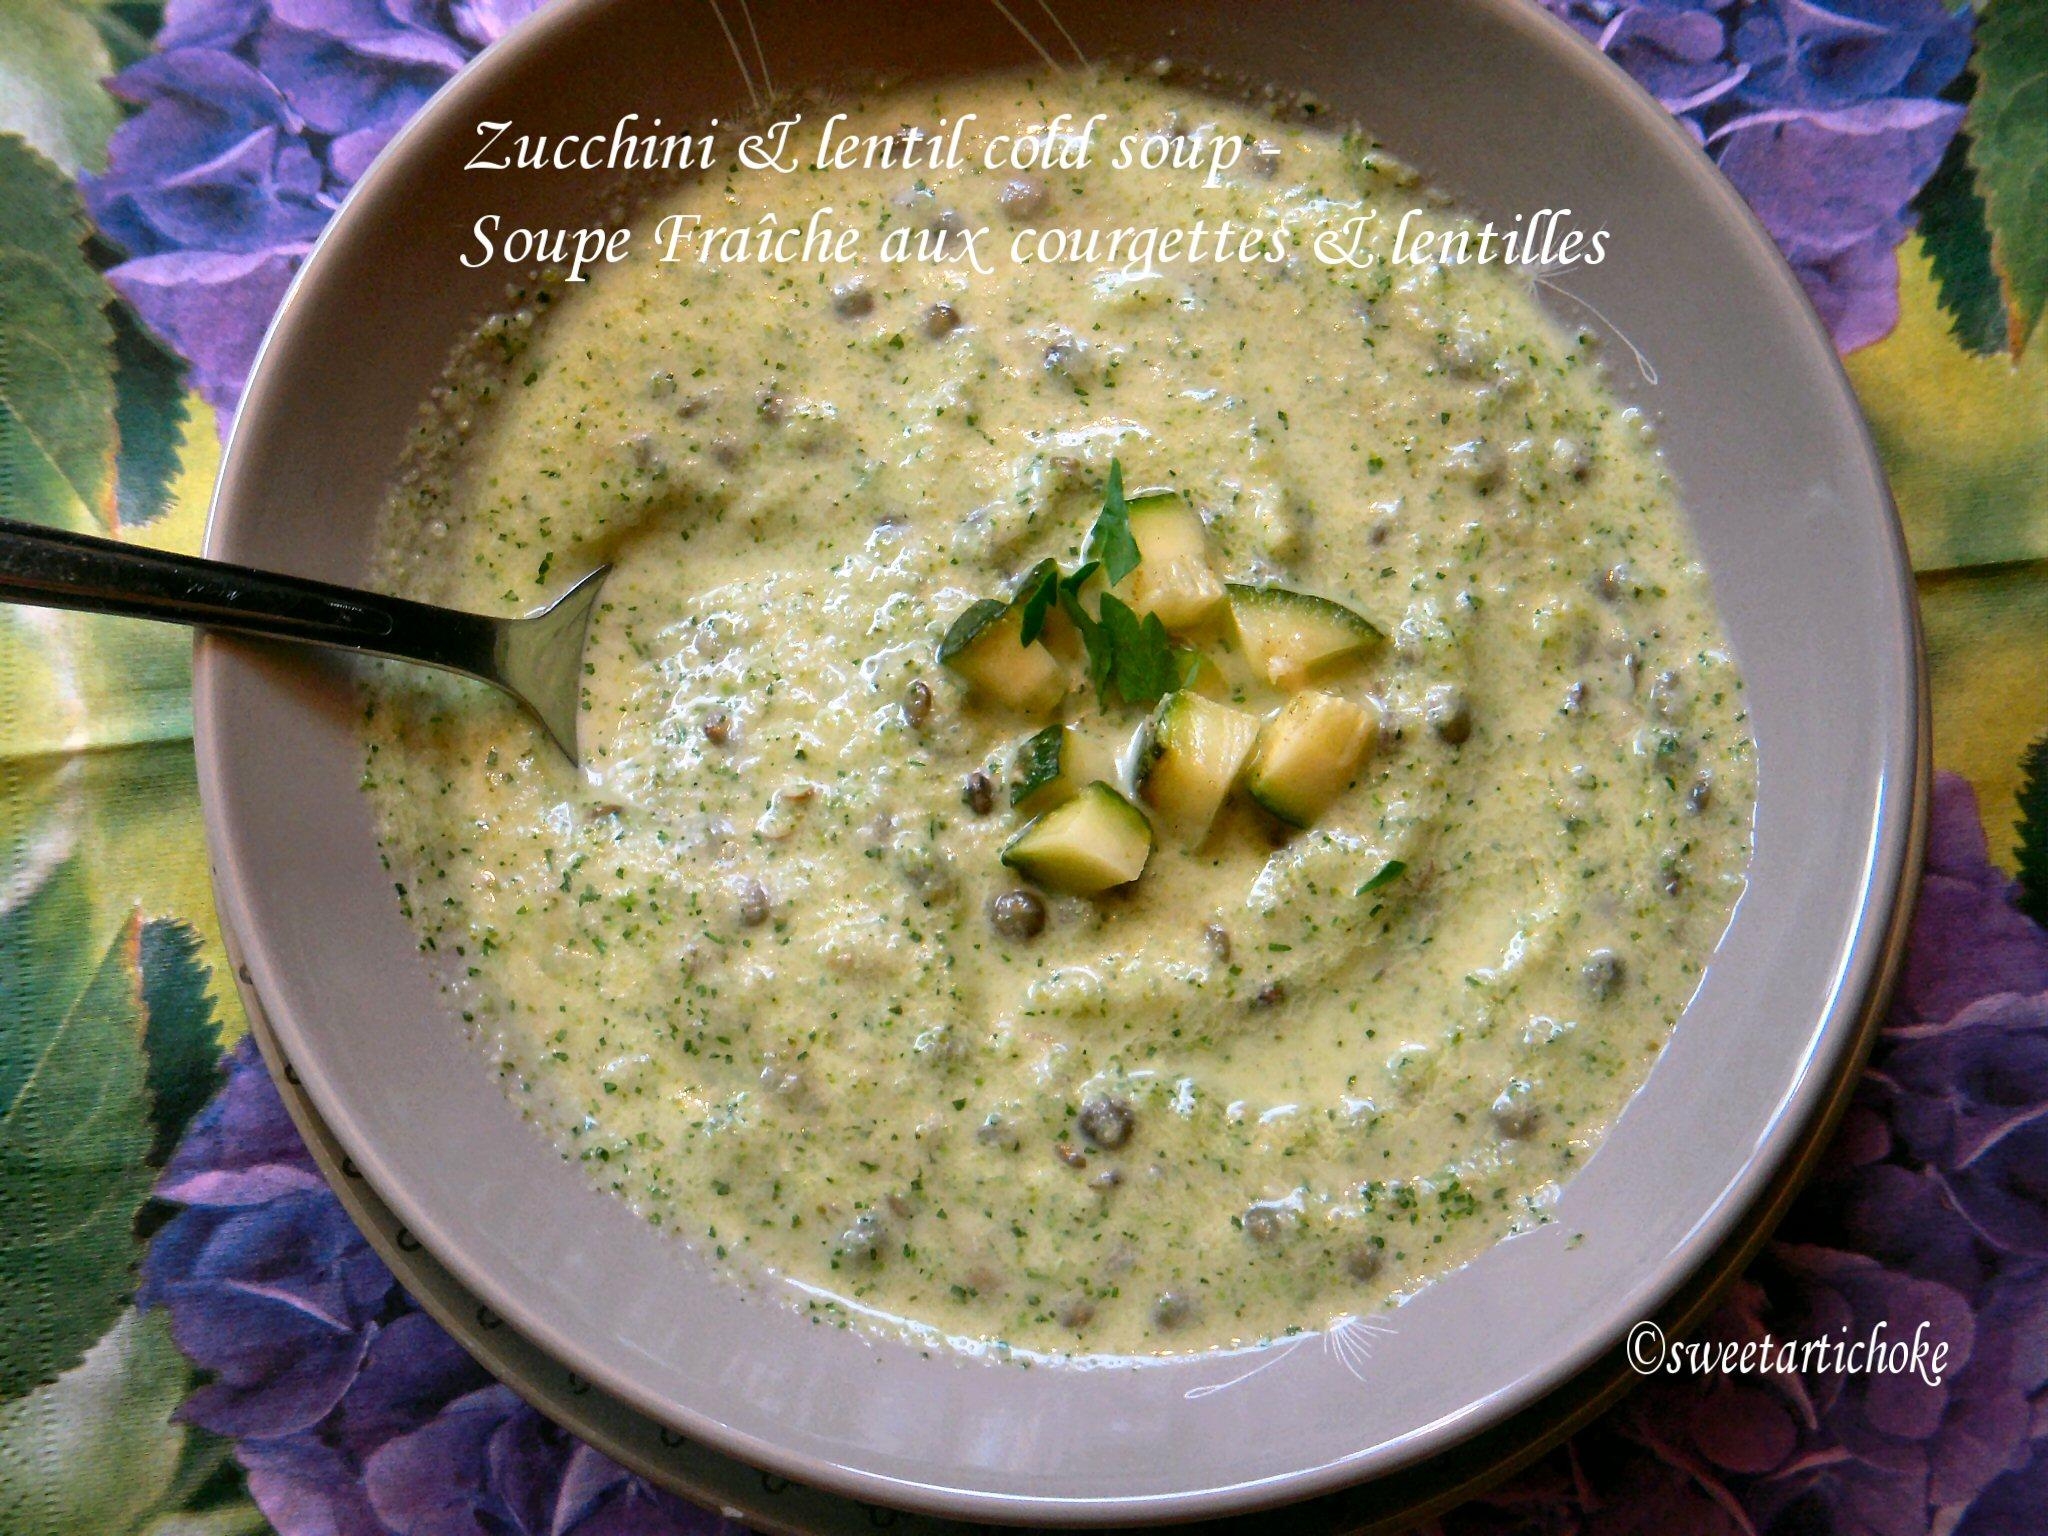 zucchini zucchini soup img 9248 silky zucchini soup soupe creamy basil ...